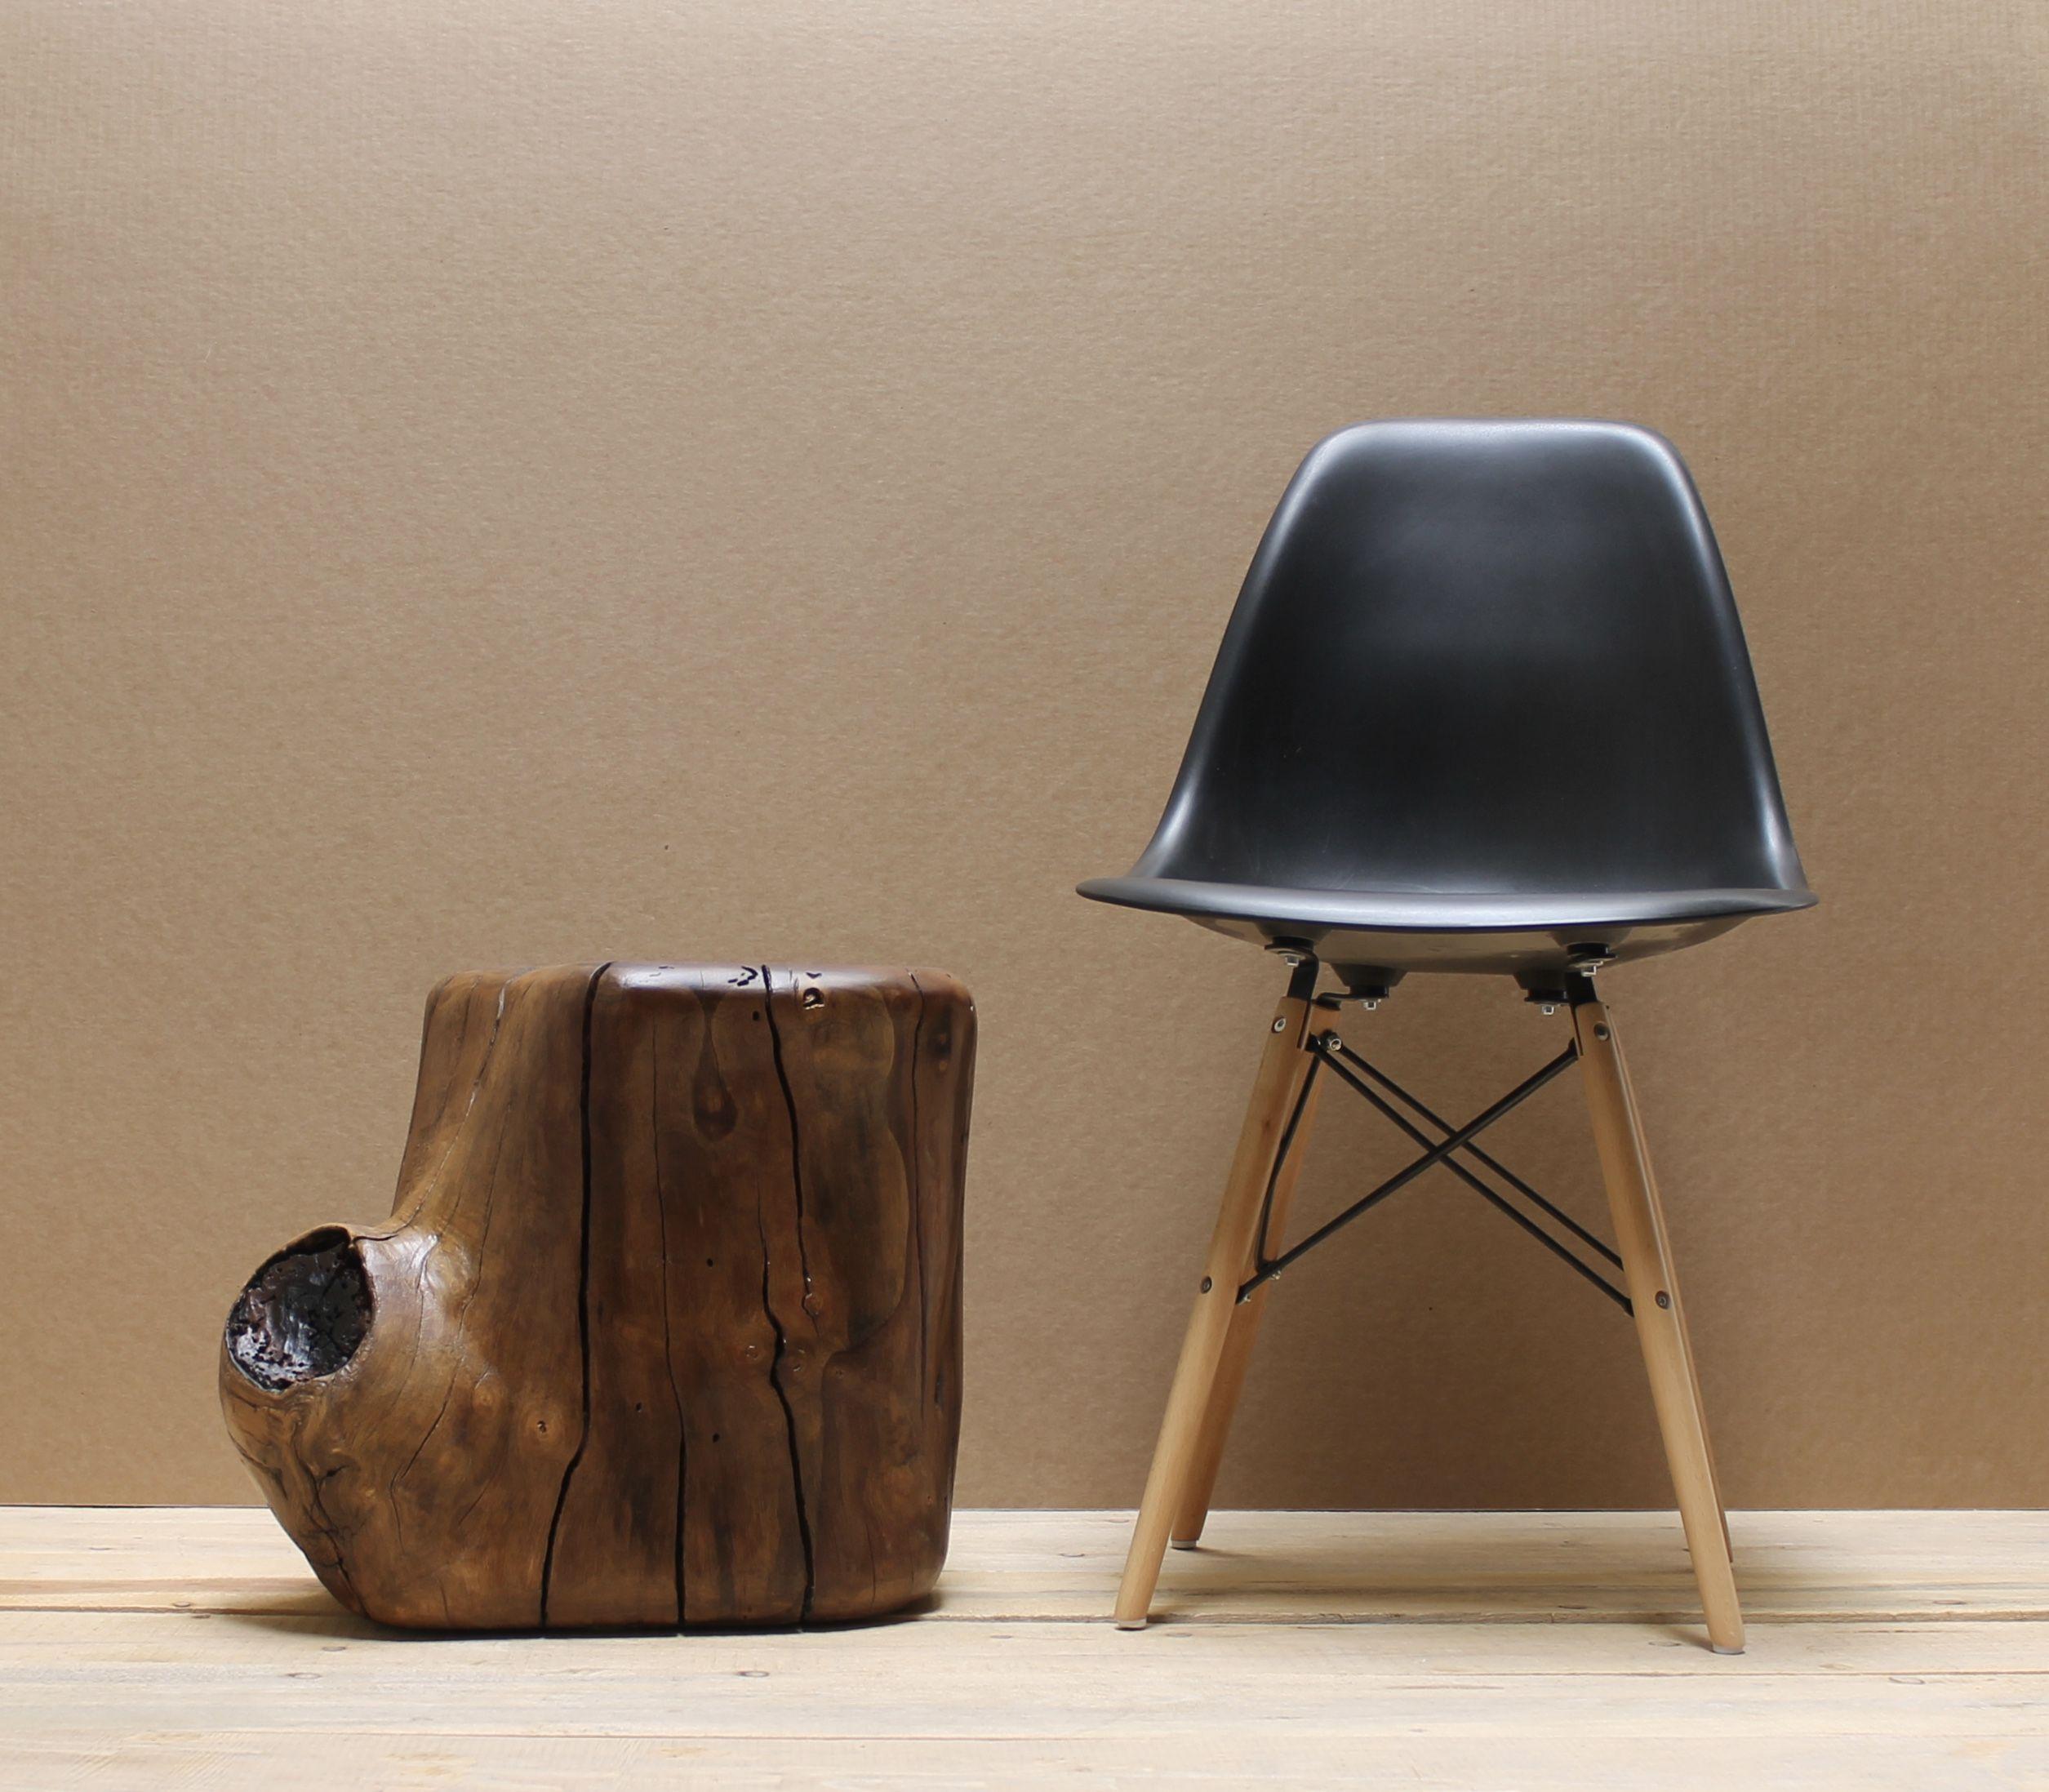 Walnut tree stump side table from kiln dried tree section fine furniture finish